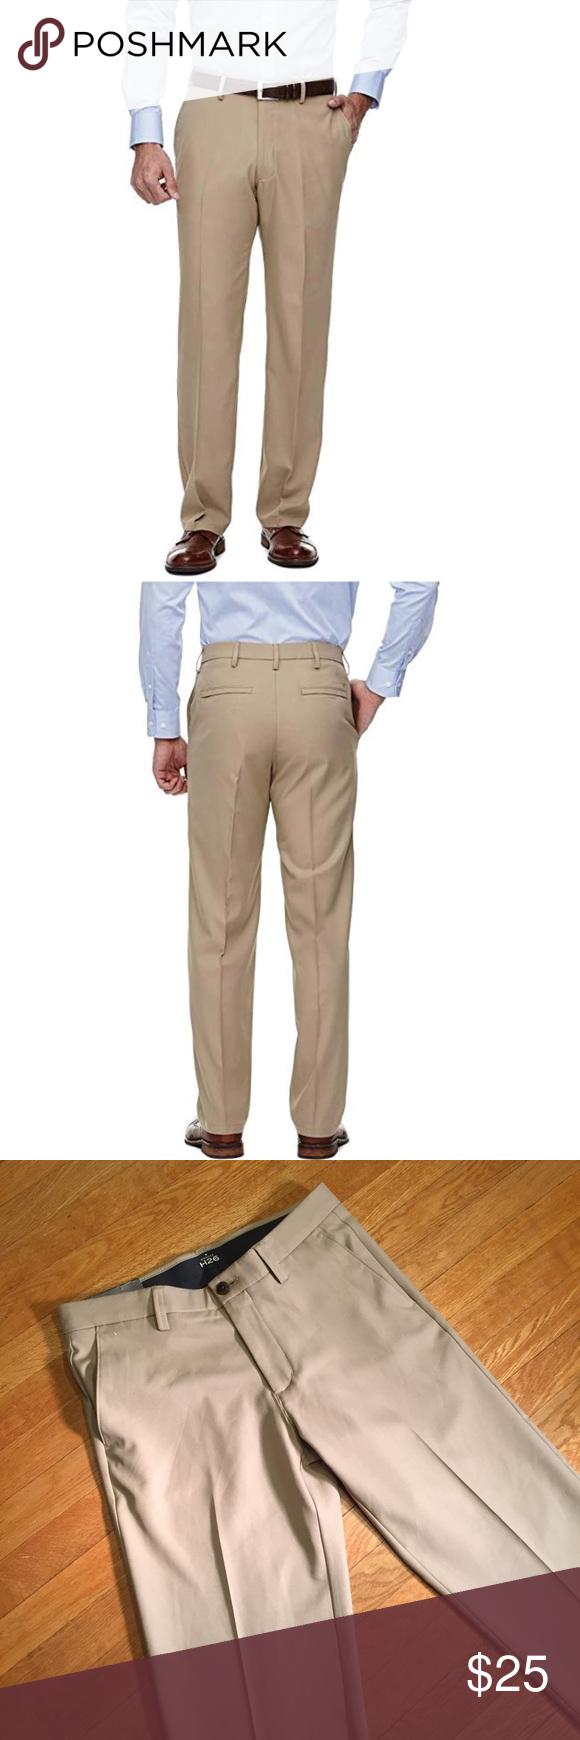 Haggar H26 Men/'s Straight Fit Performance Dress Pant 32 x 32 Khaki